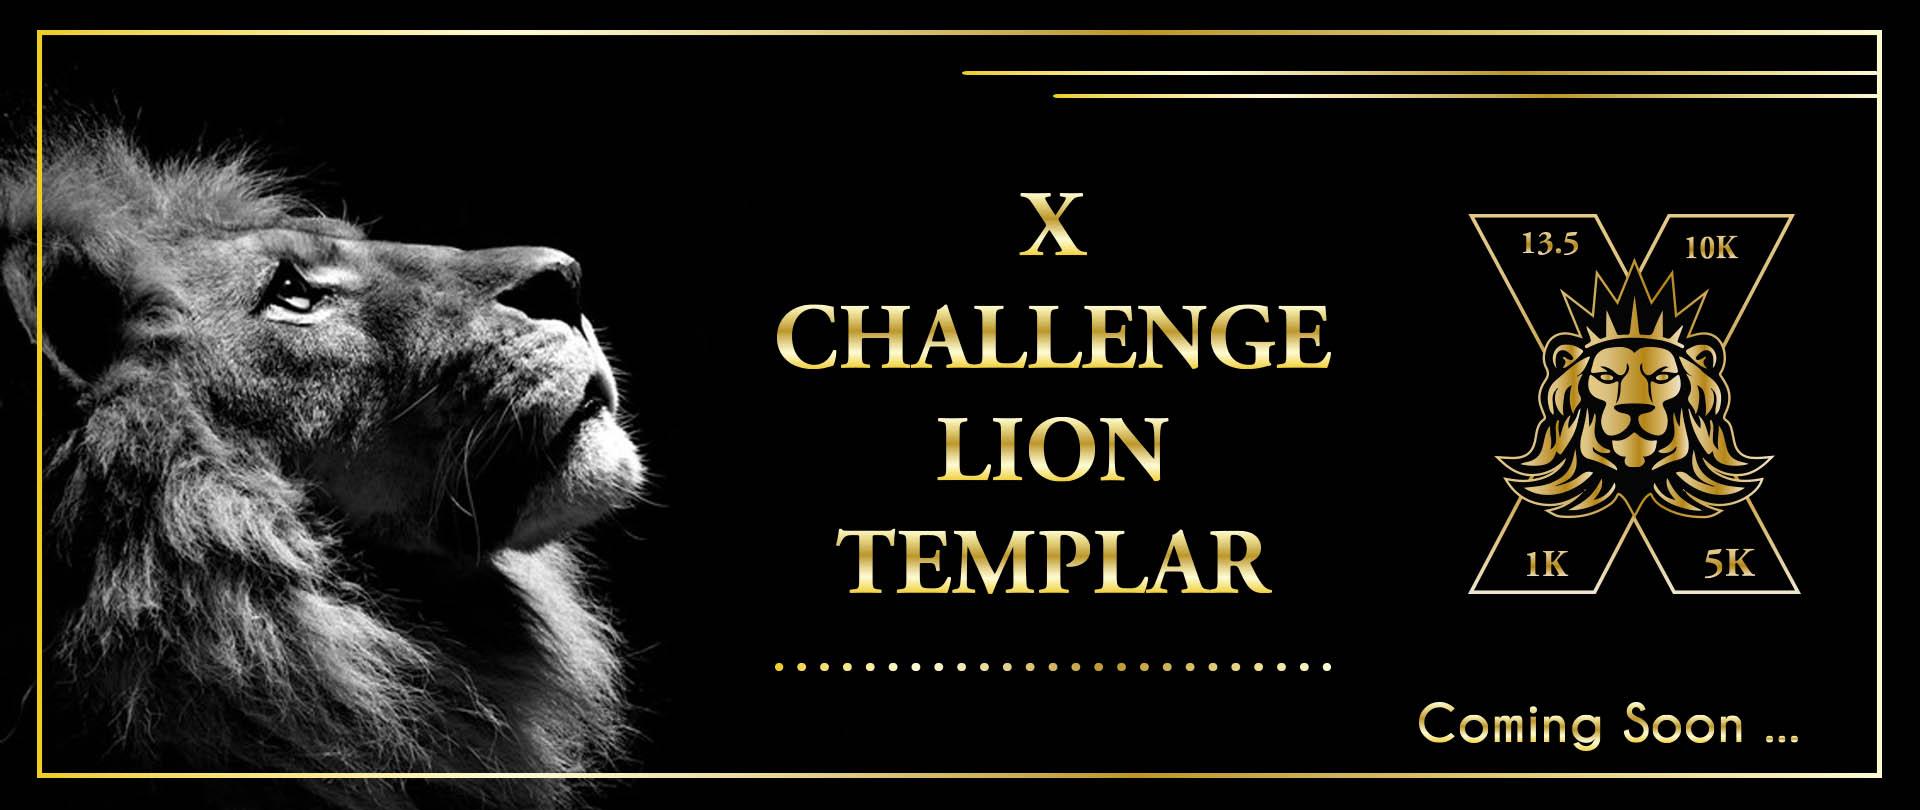 X challenger and Lion Templar